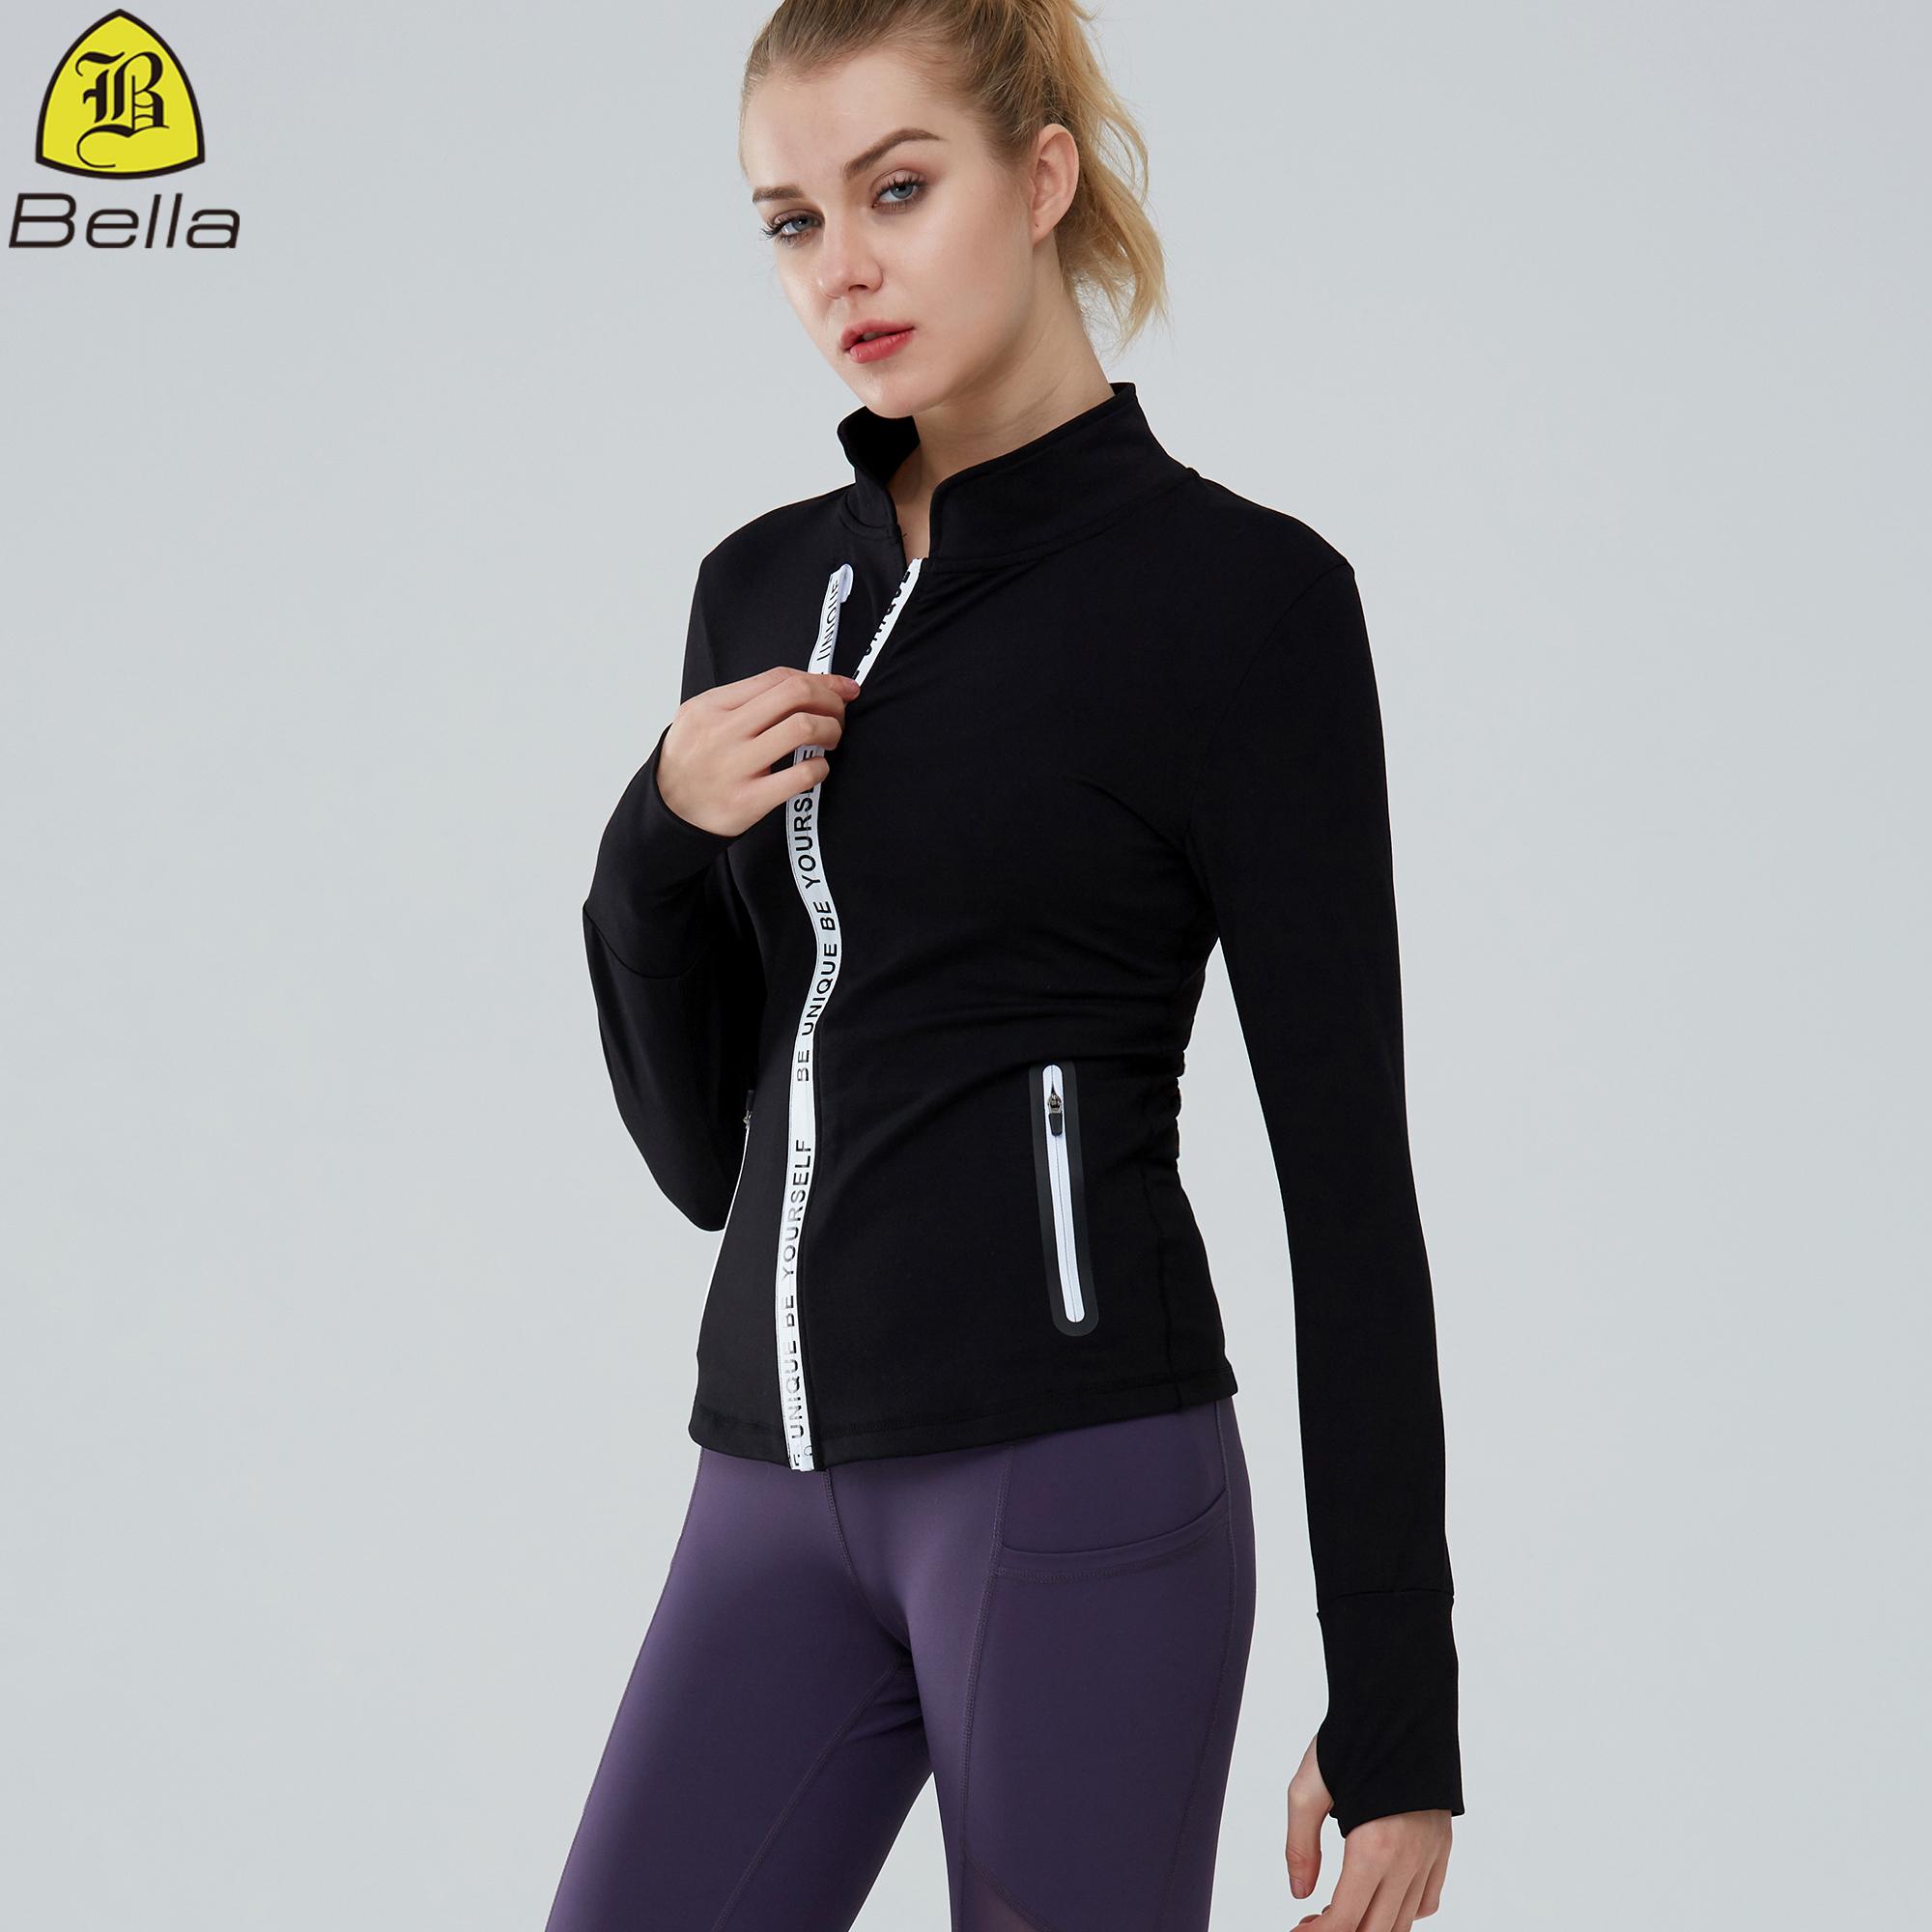 Wholesale thumb holes sports wear fashion women slim tight yoga jacket